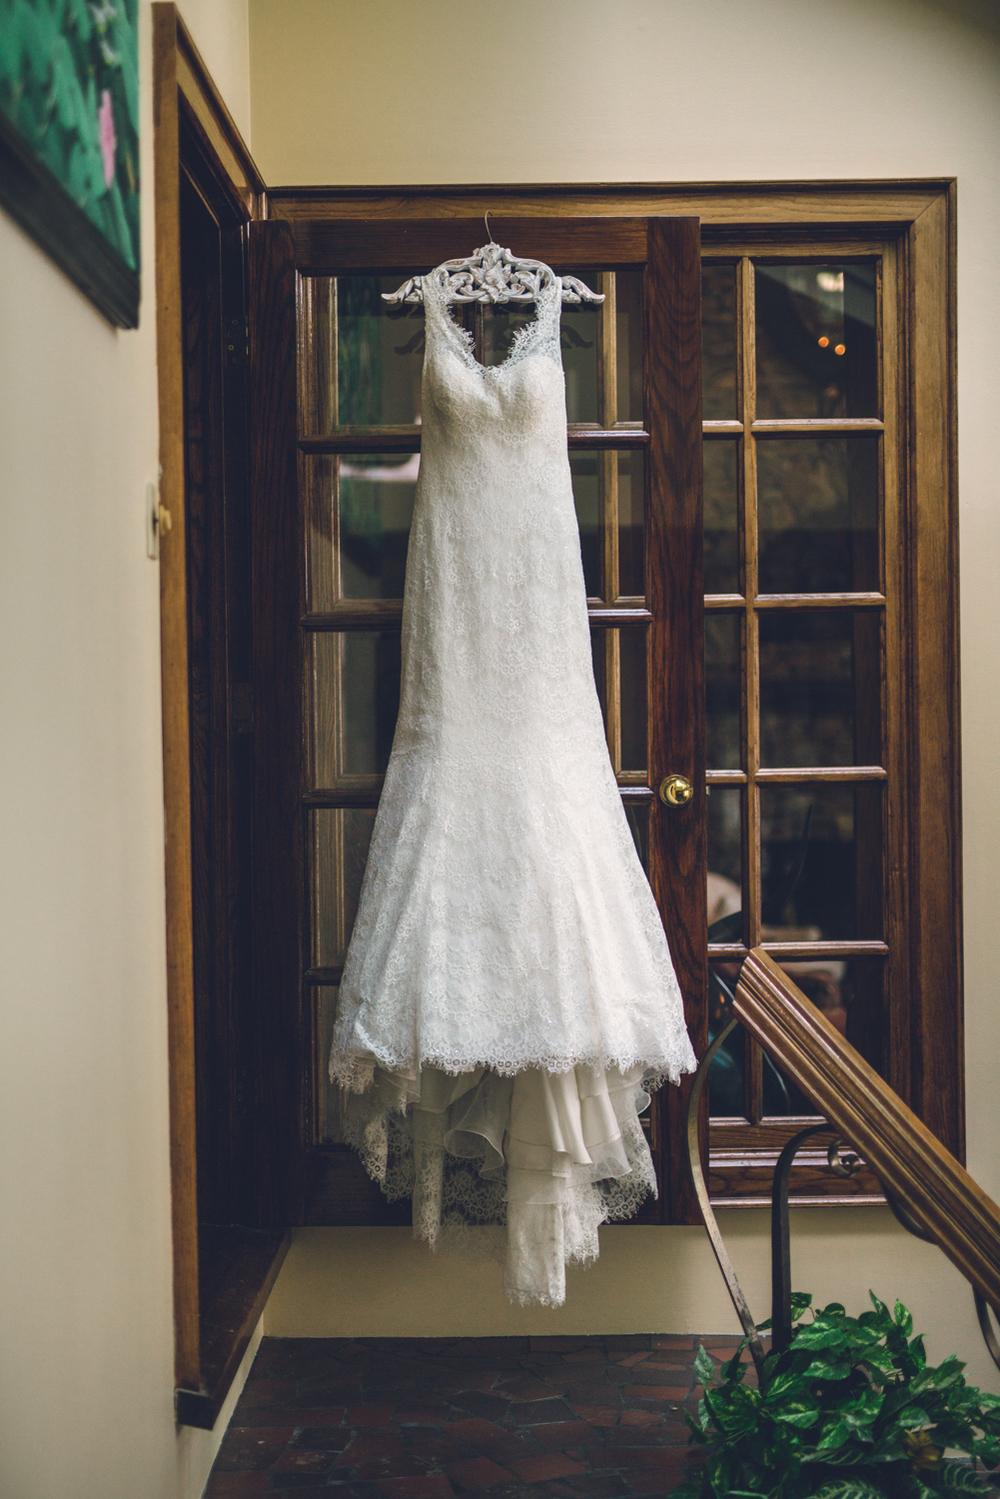 celebrationsatthereservoir-wedding-virginiaweddingphotographer-6.jpg